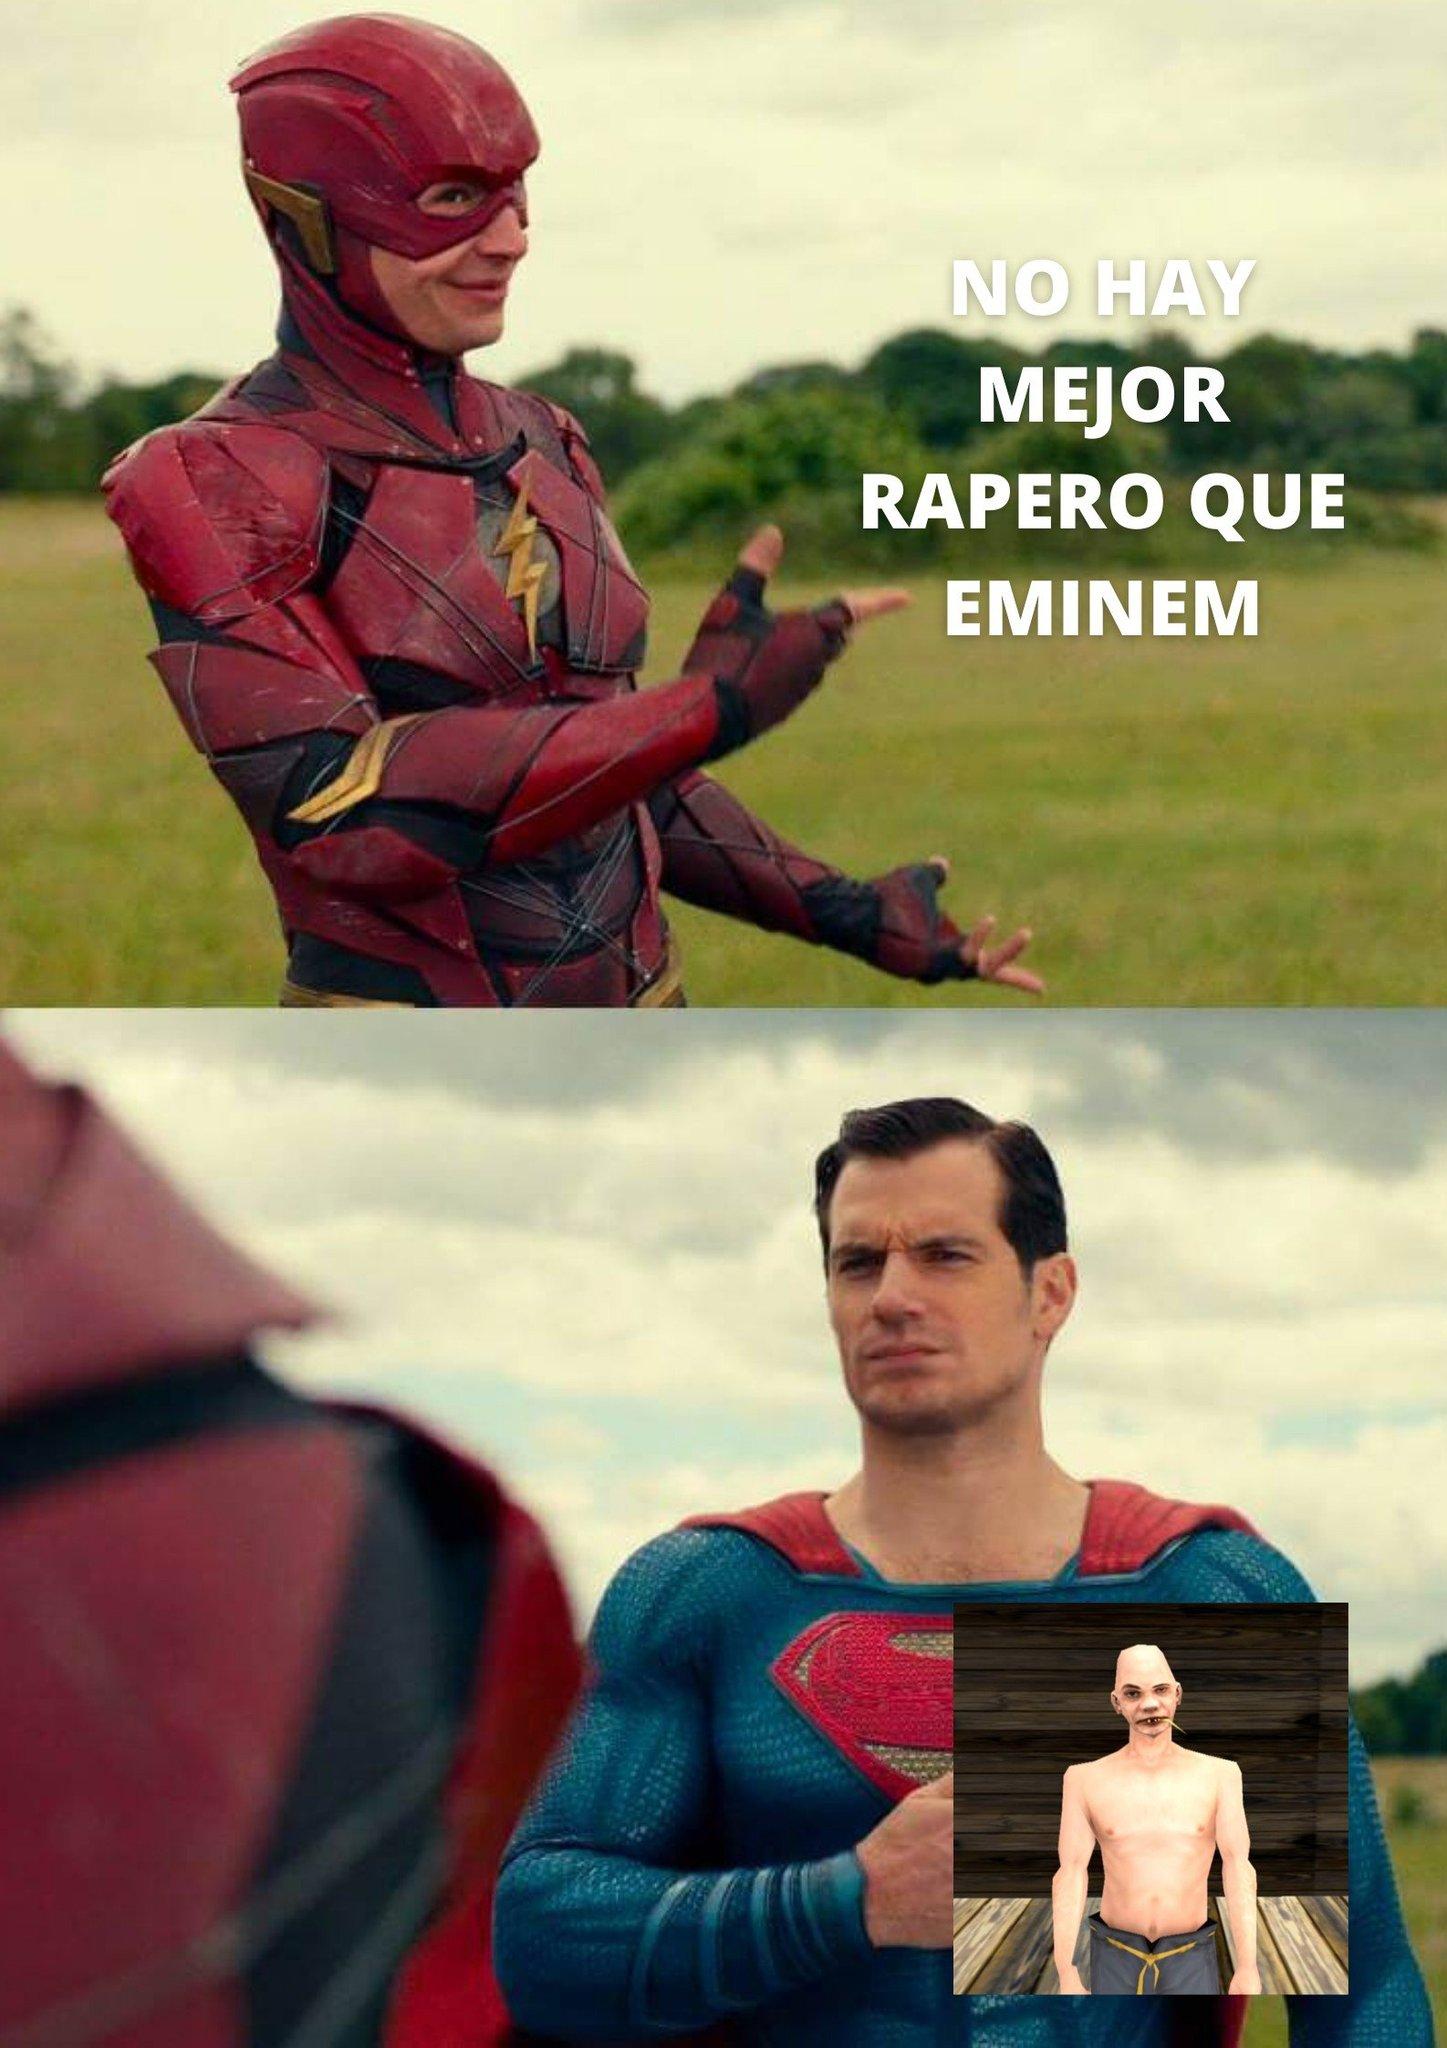 Tío Gilipollas - meme